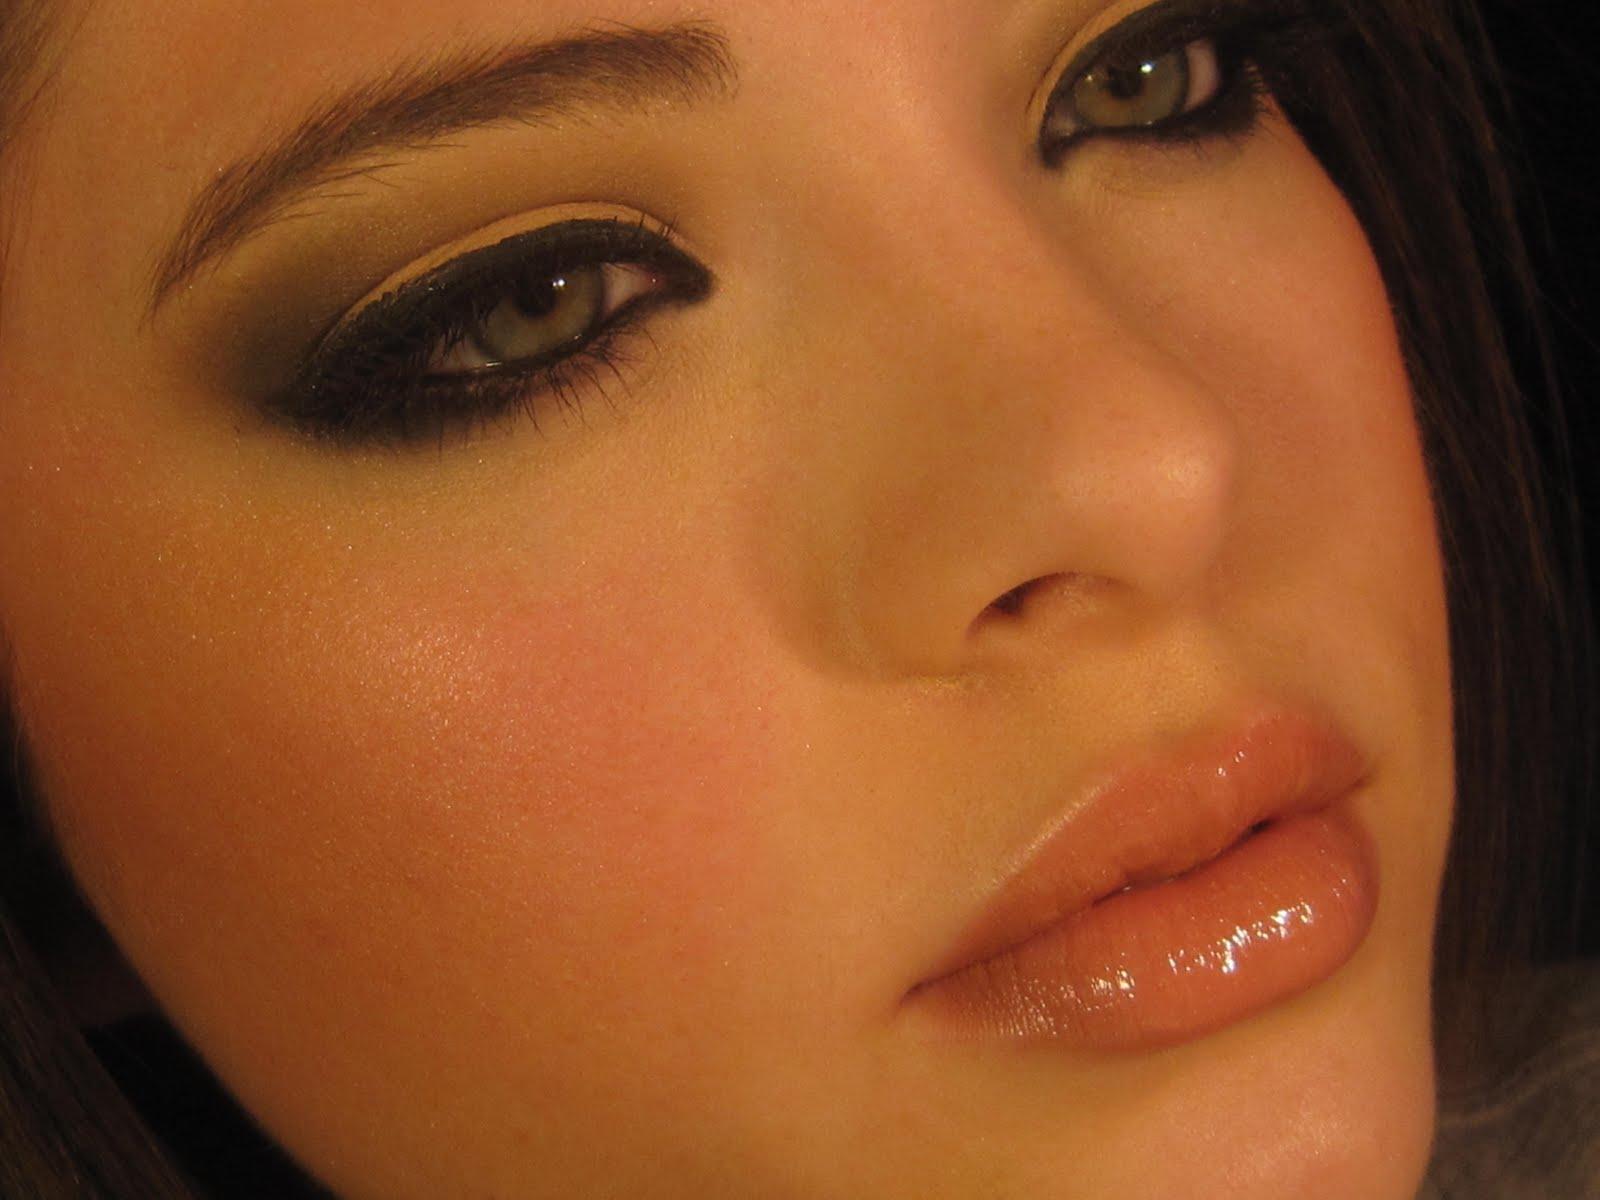 stephbusta u0026 39 s beauty blog  mila kunis cosmo makeup  2011